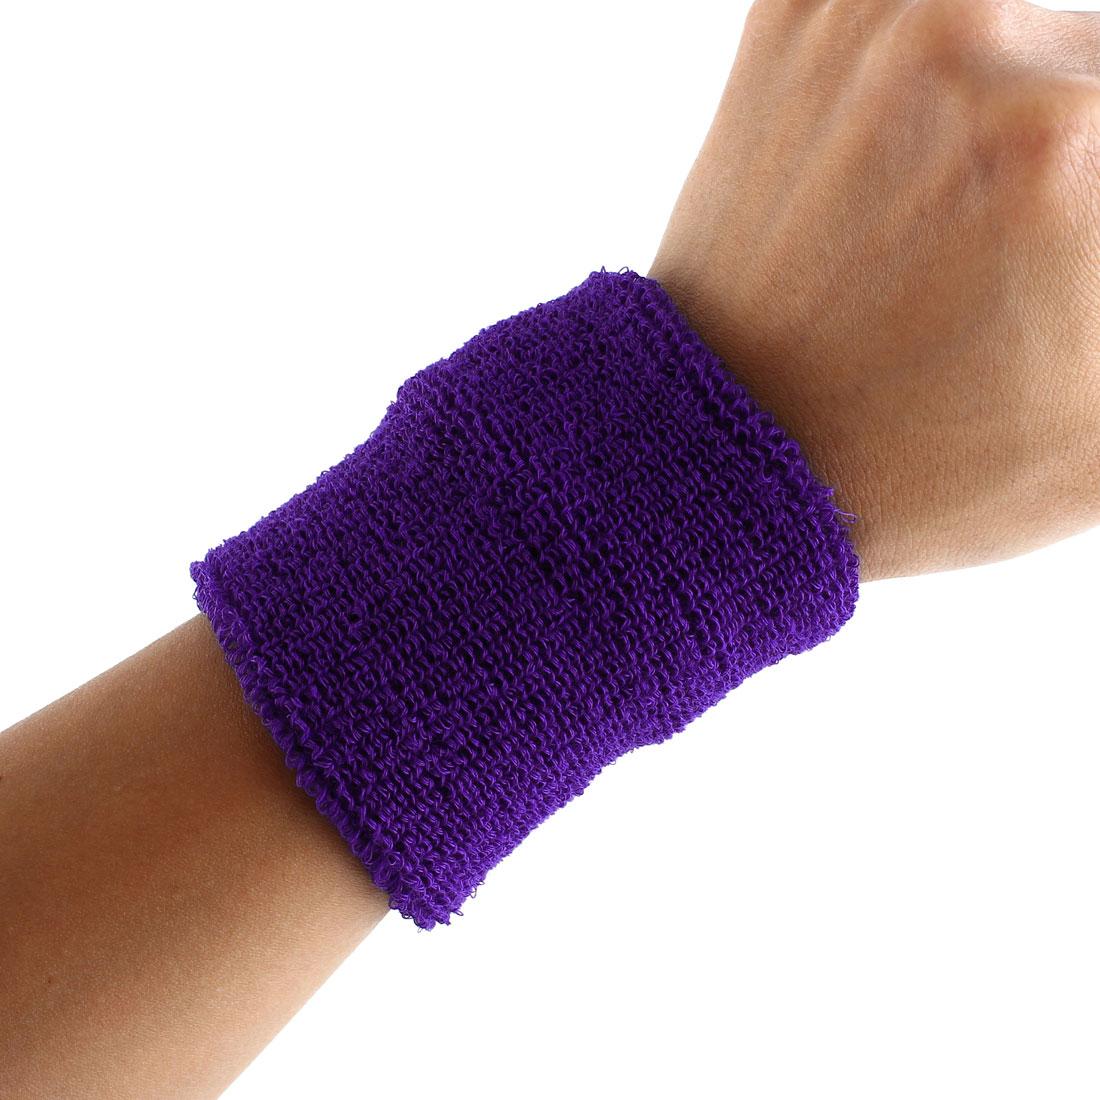 Exercises Gym Running Elastic Breathable Hand Protector Bandage Sweatband Wristband Sport Wrist Purple 2pcs